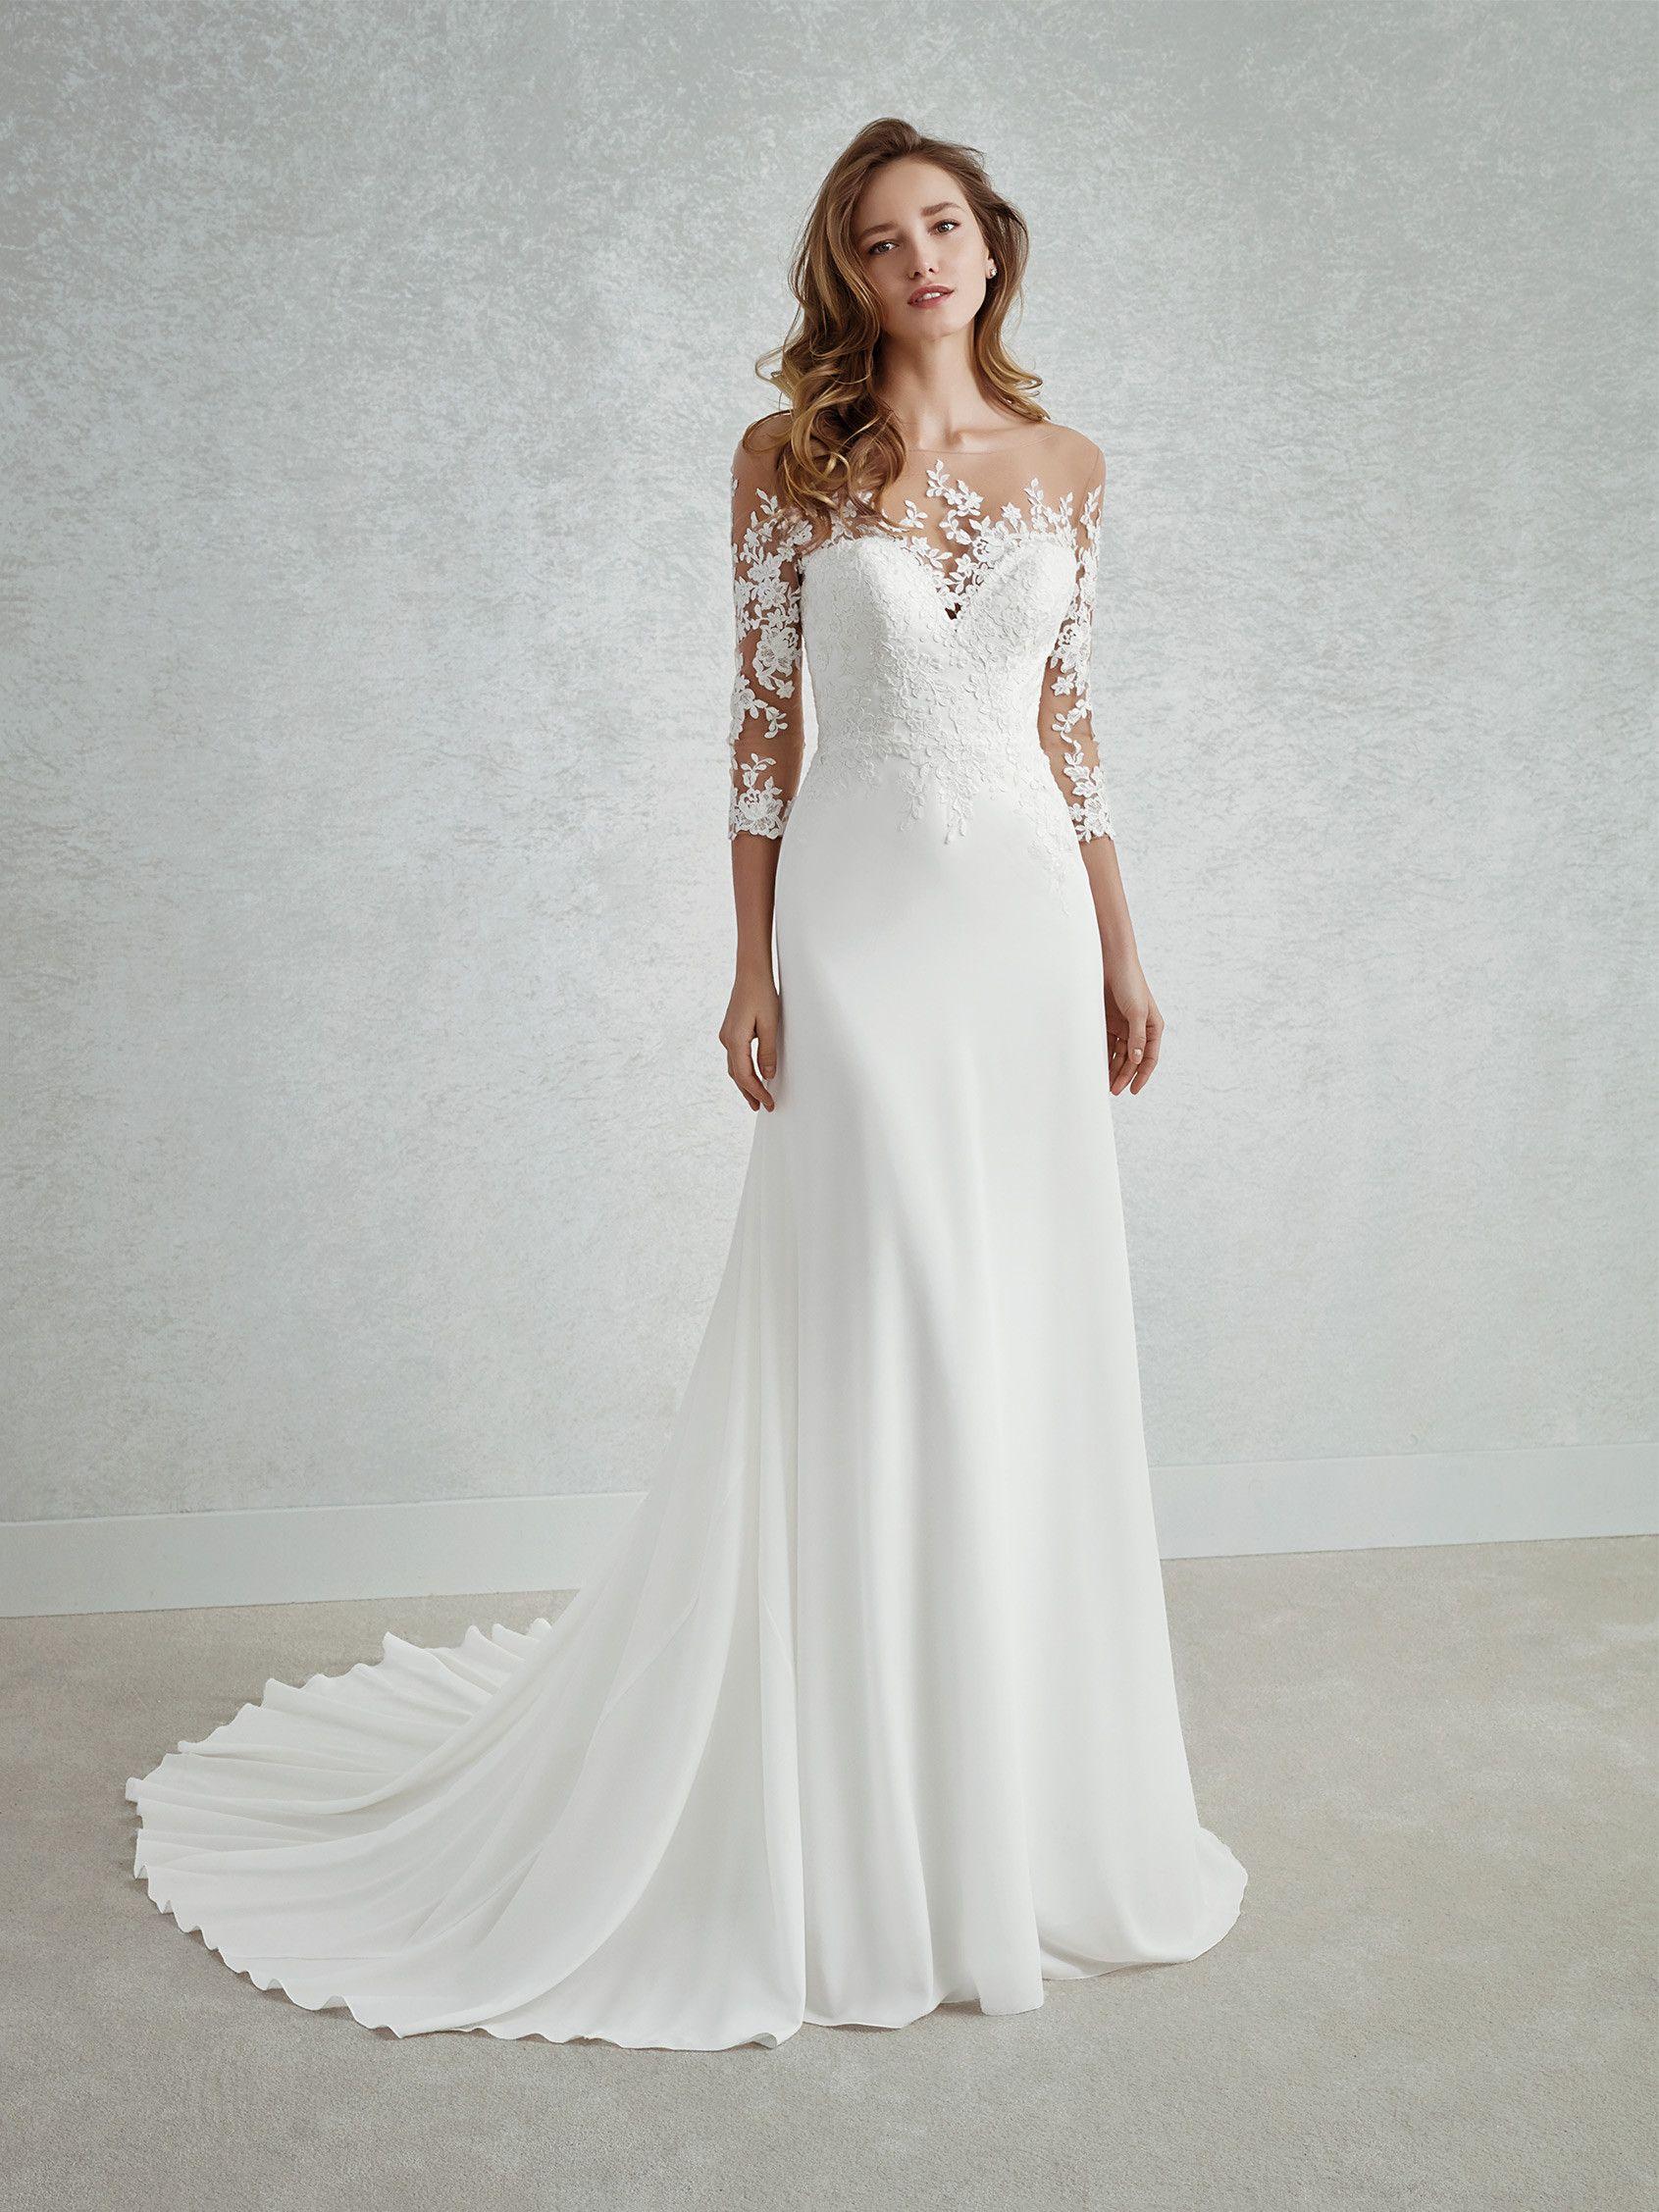 Finura wedding pinterest illusion neckline wedding dress and